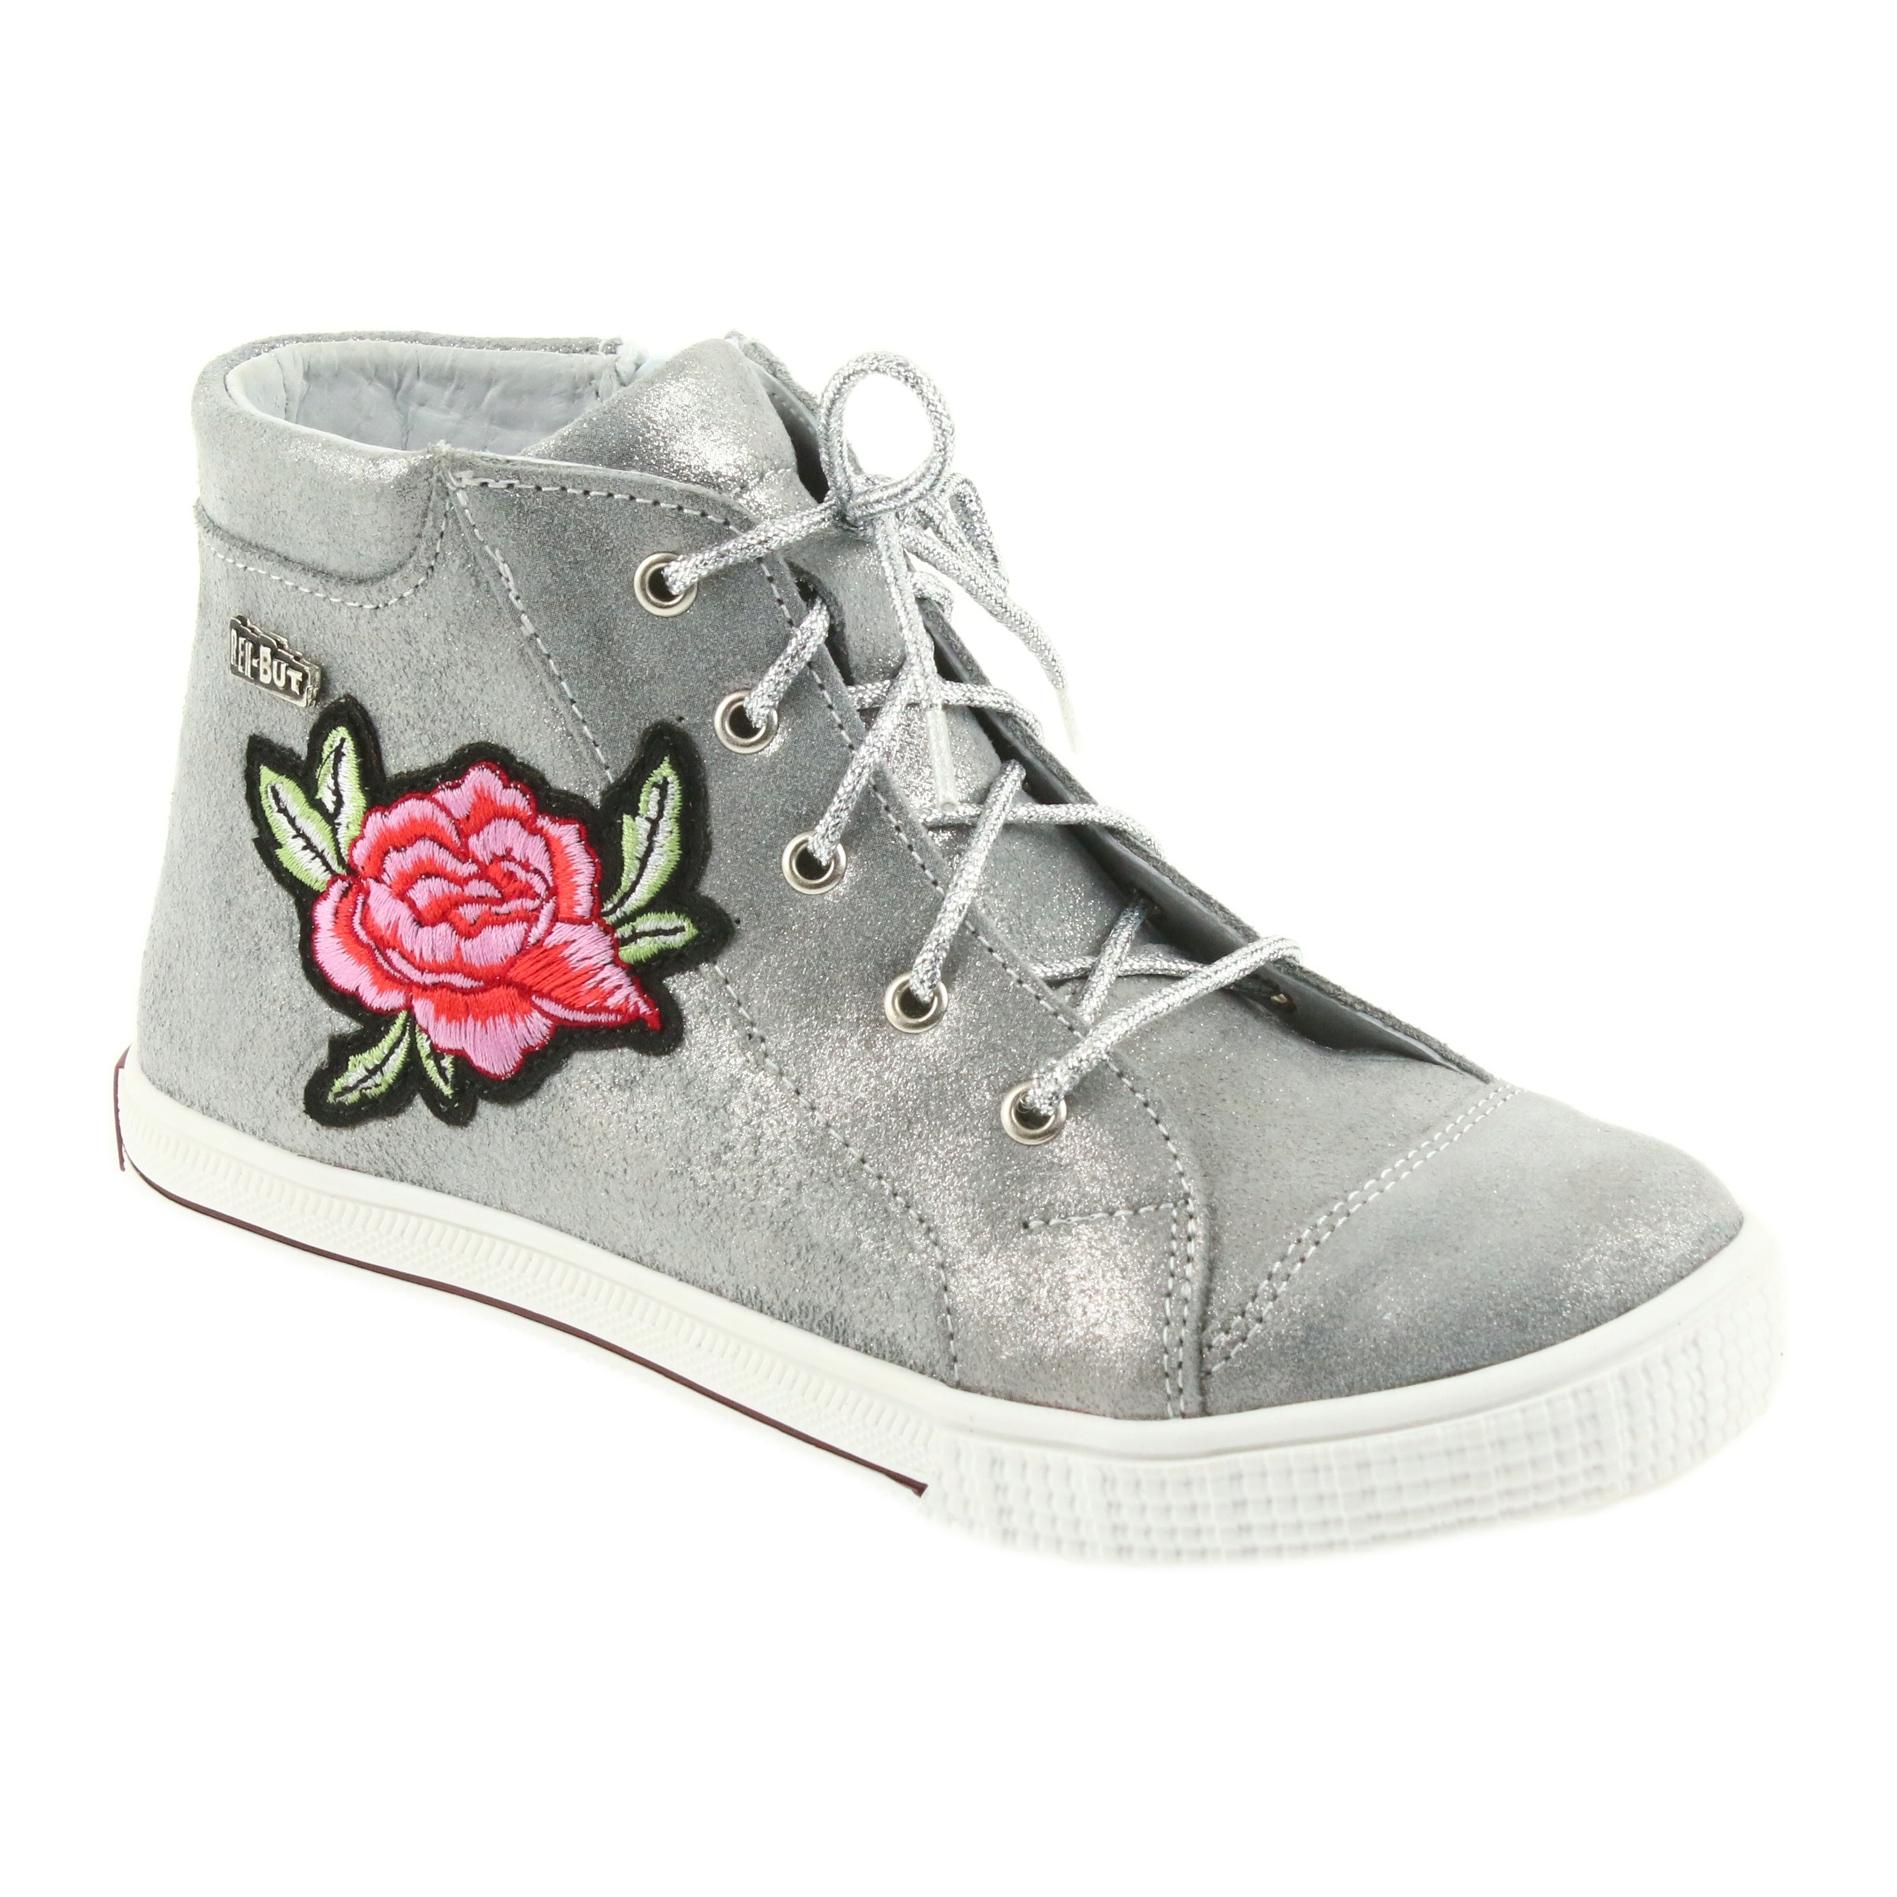 d605c15bd Ren But grå Sko sko piger sølv Ren Men 4279